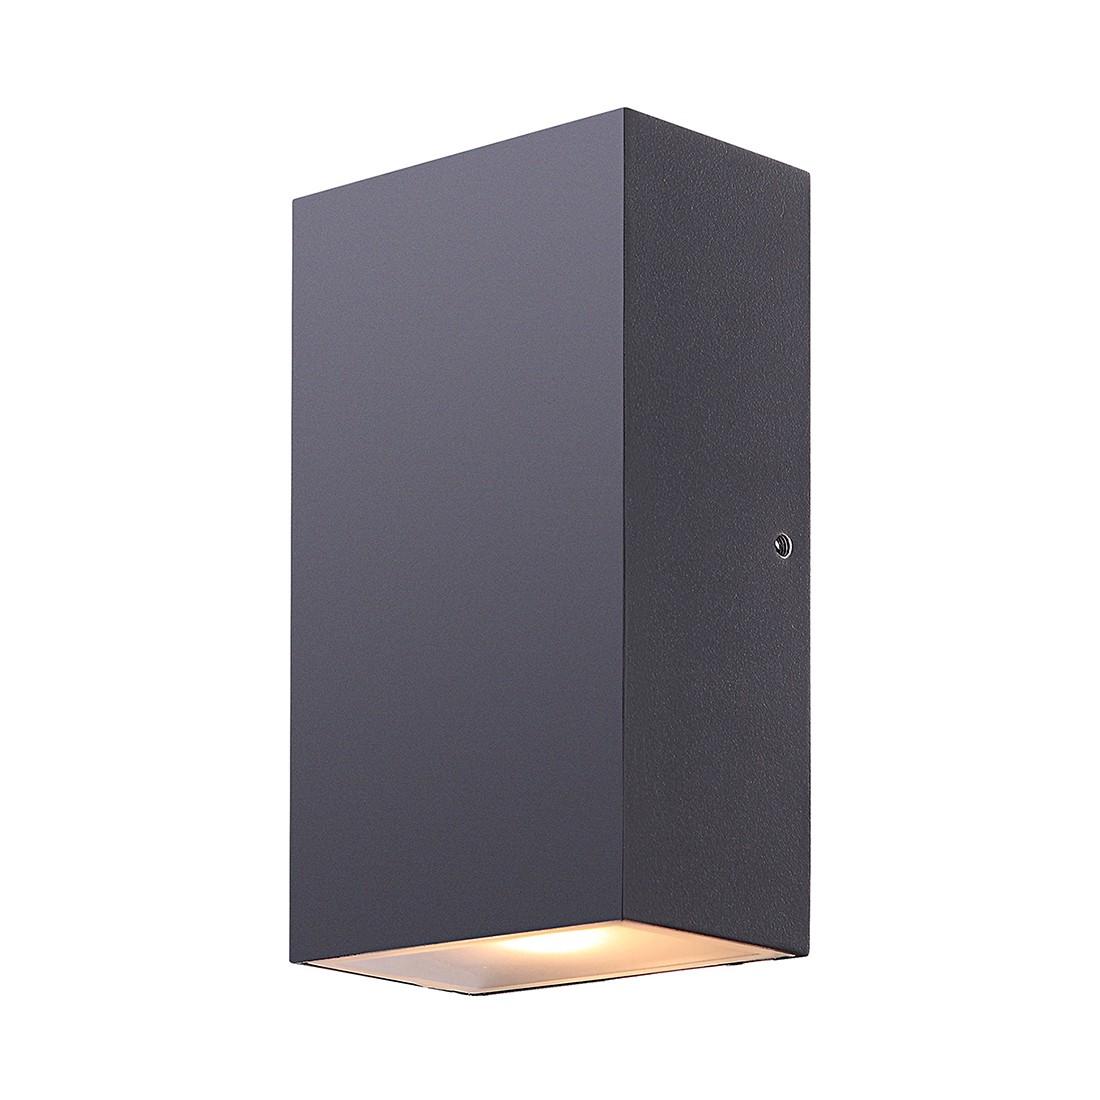 EEK A+, LED-Außenleuchte Evalia by Globo - Aluminium/Glas - Schw bei Home24 - Lampen